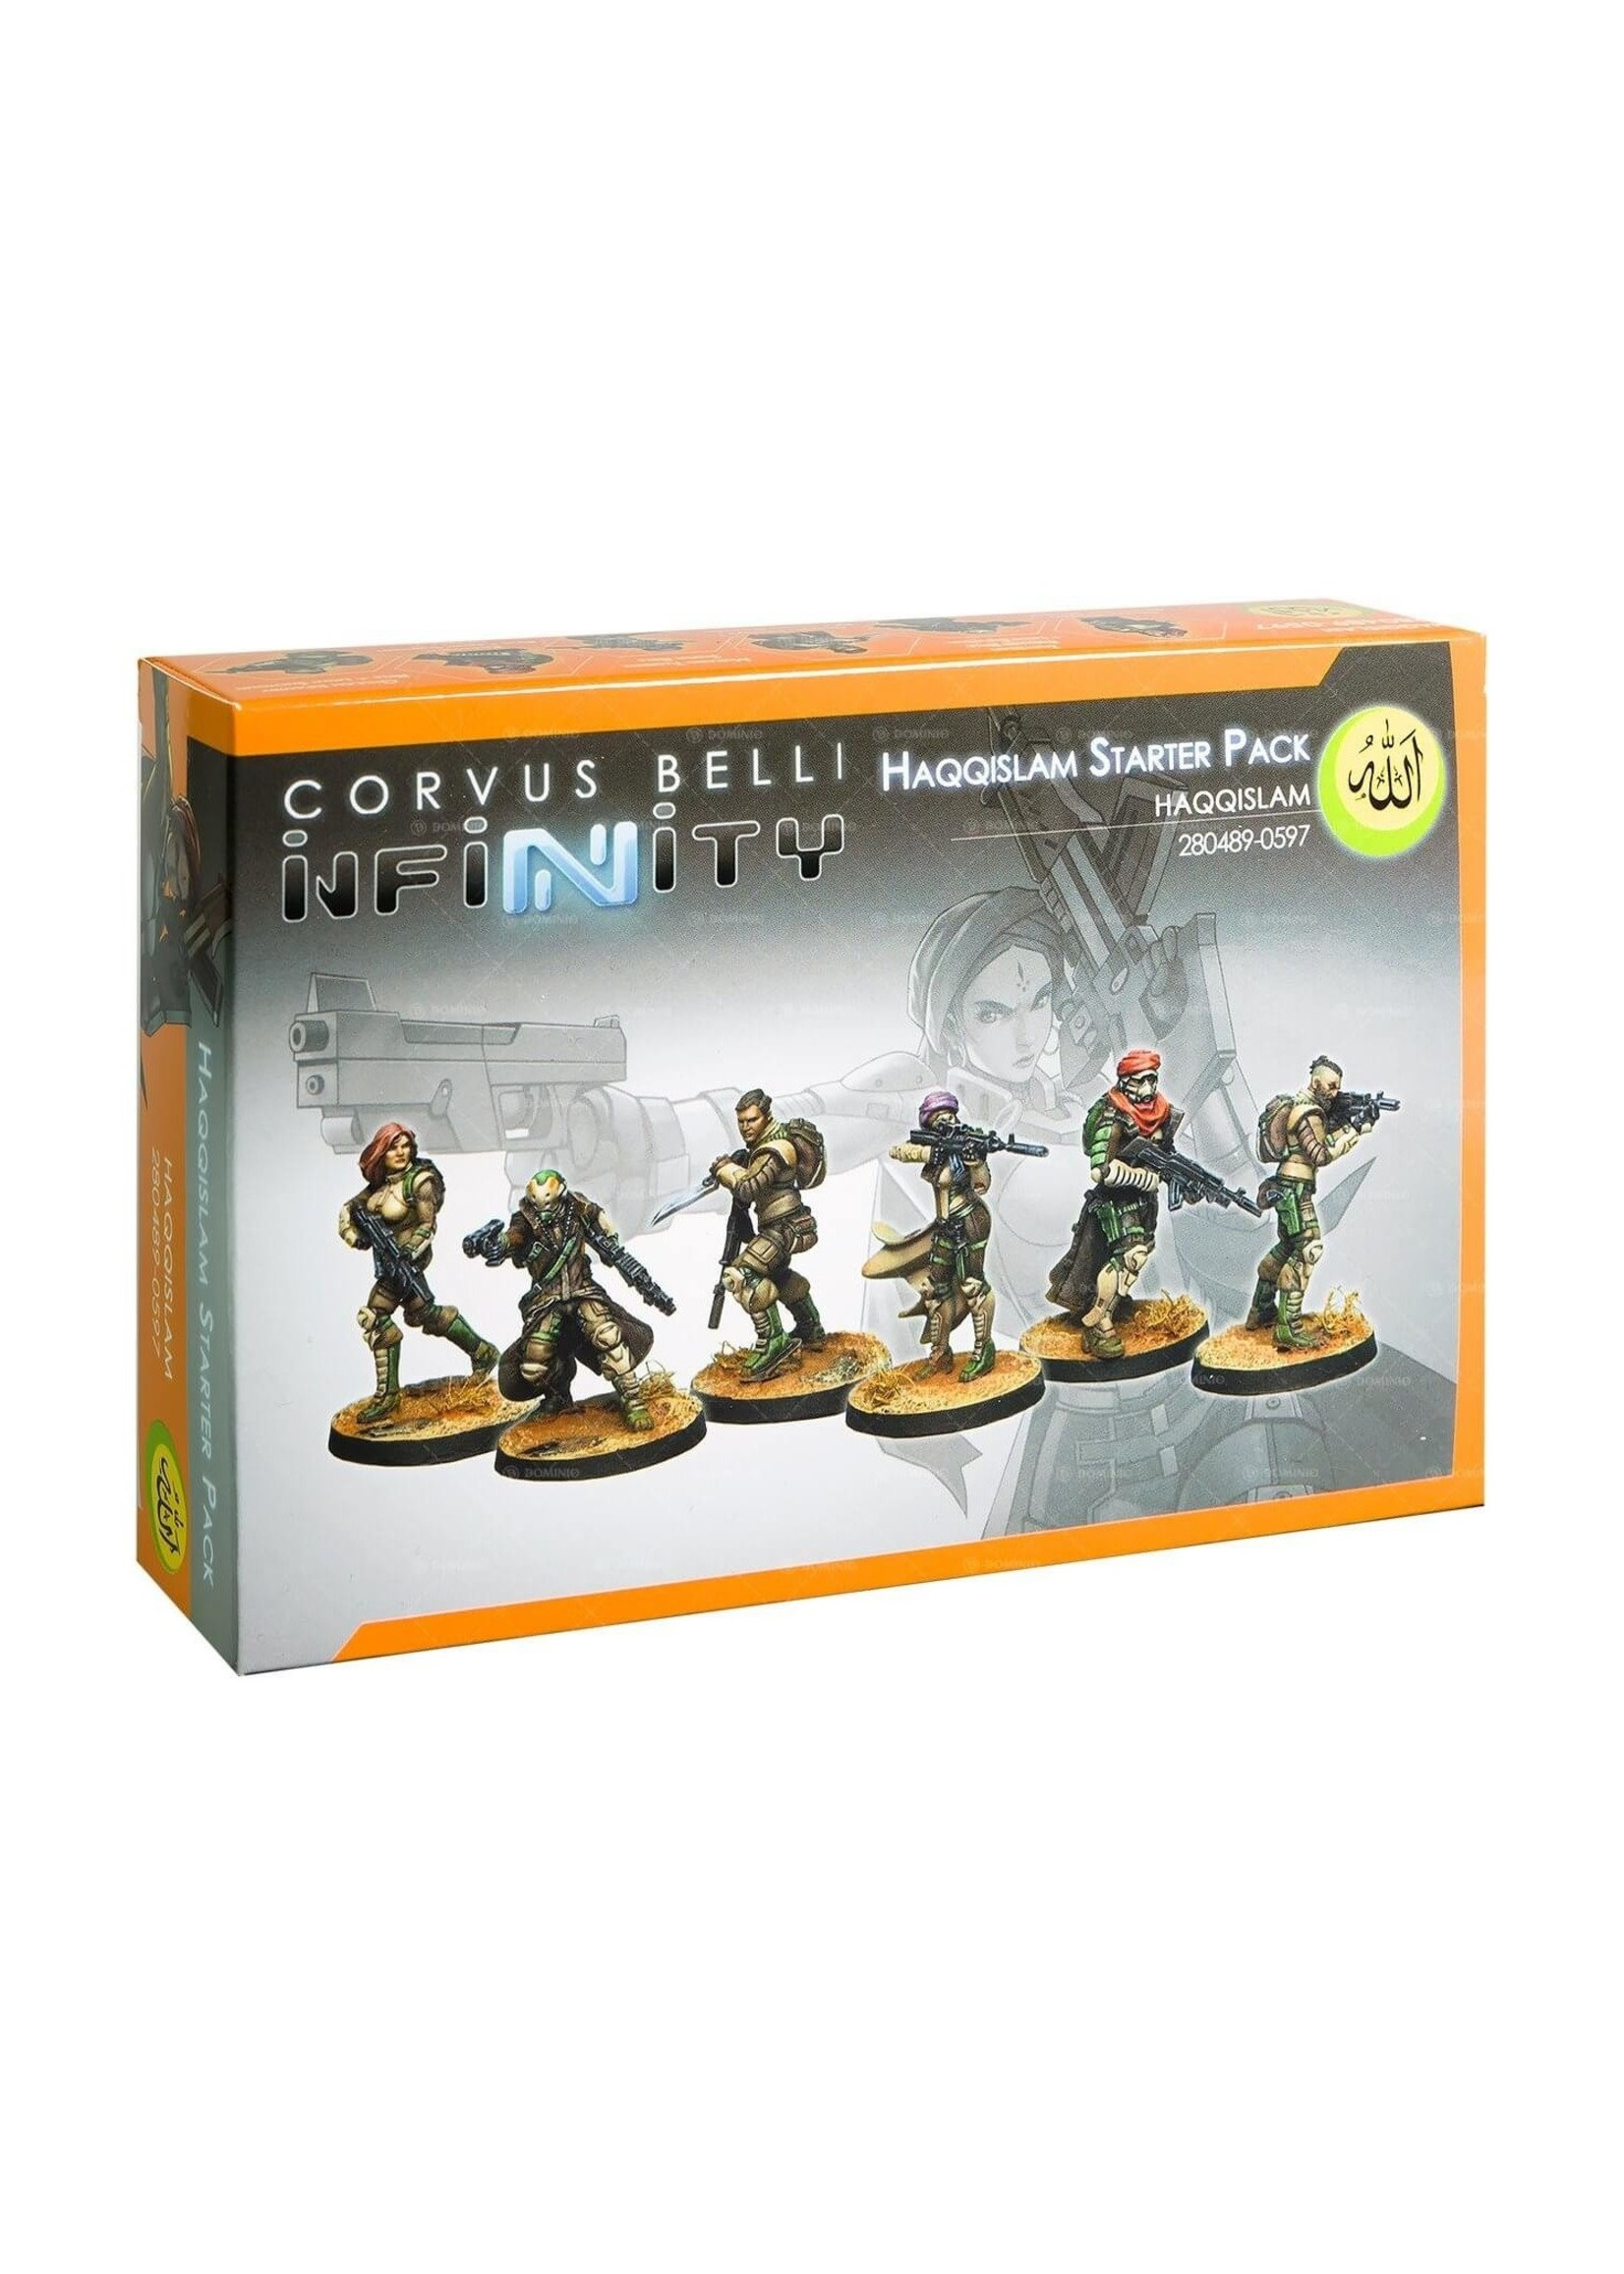 Corvus Belli Corvus Belli Infinity Haqqislam Starter Pack